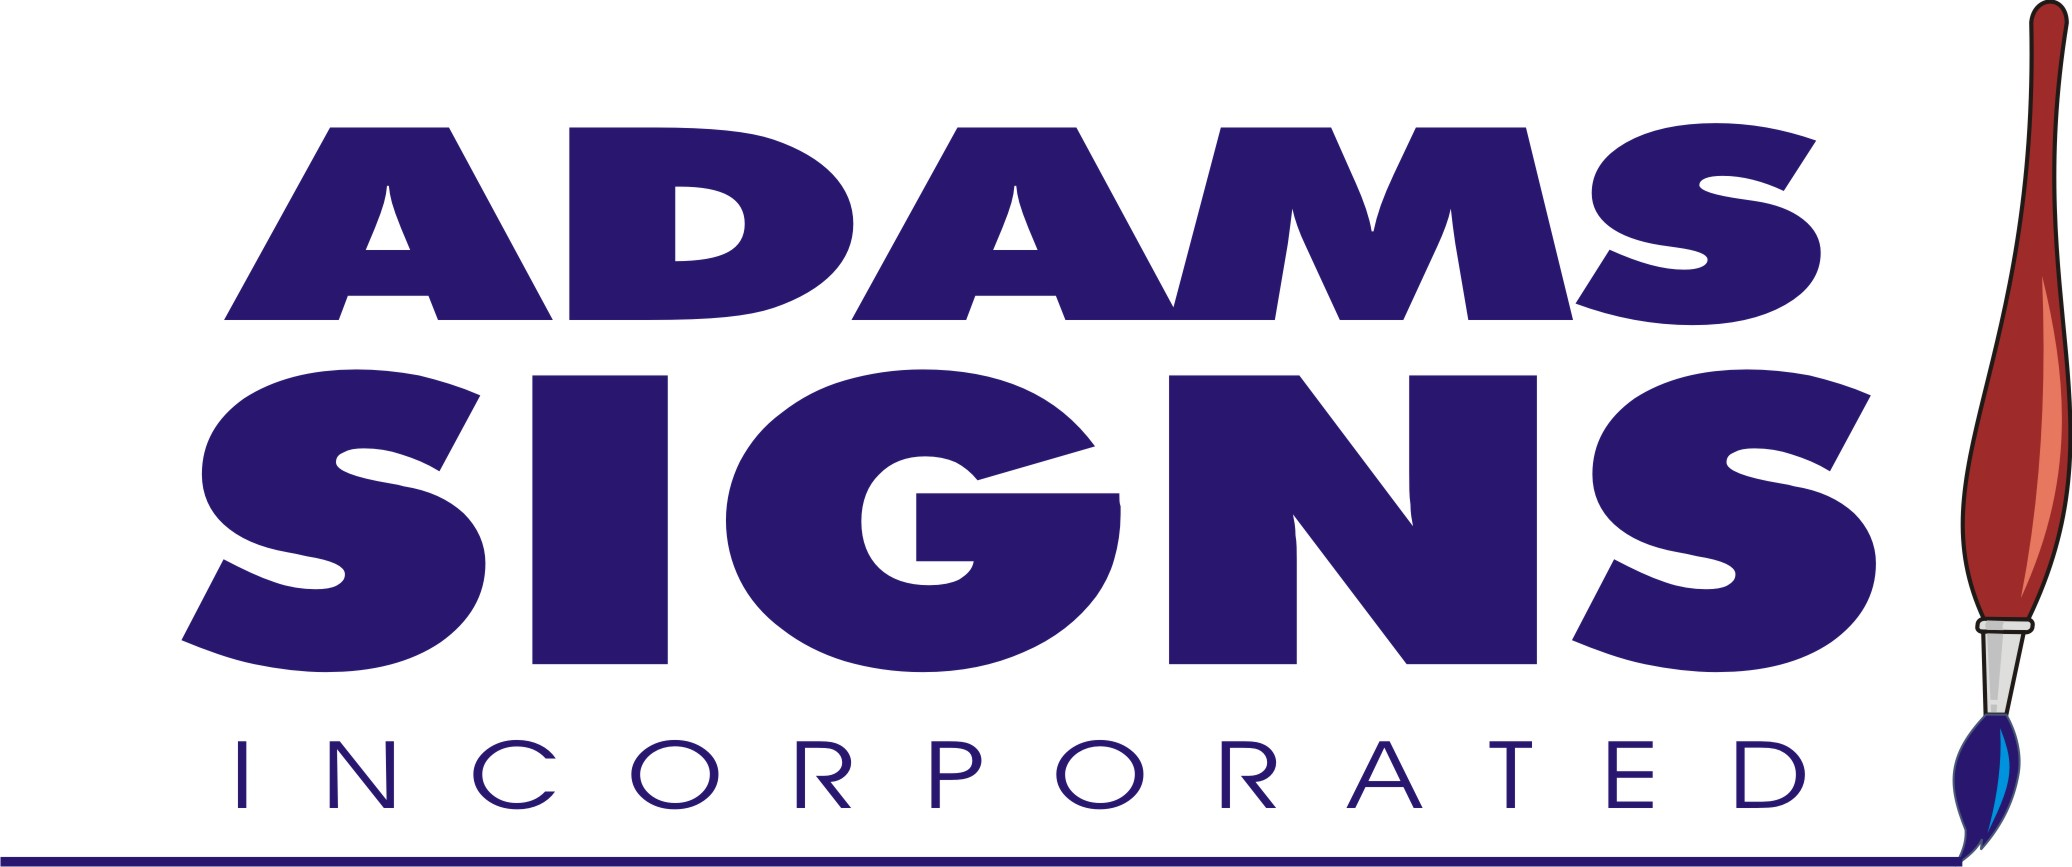 adams logo 1